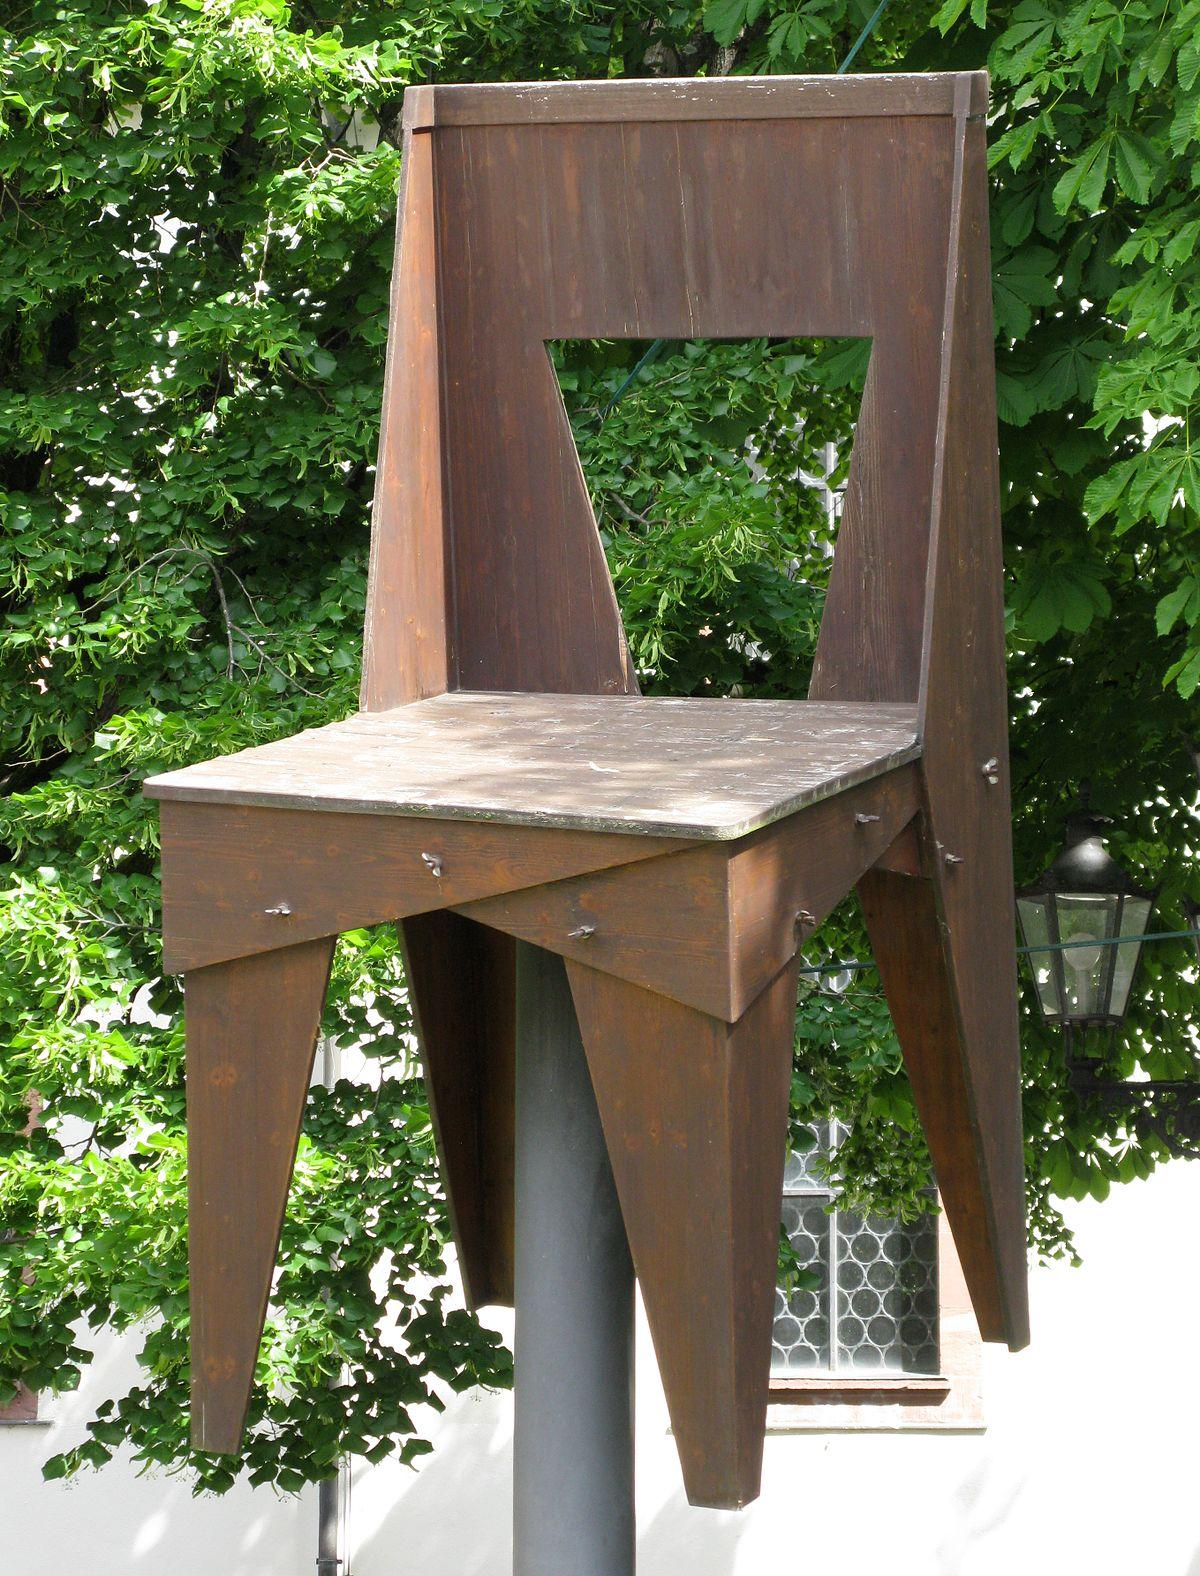 jasper morrison wikipedia. Black Bedroom Furniture Sets. Home Design Ideas